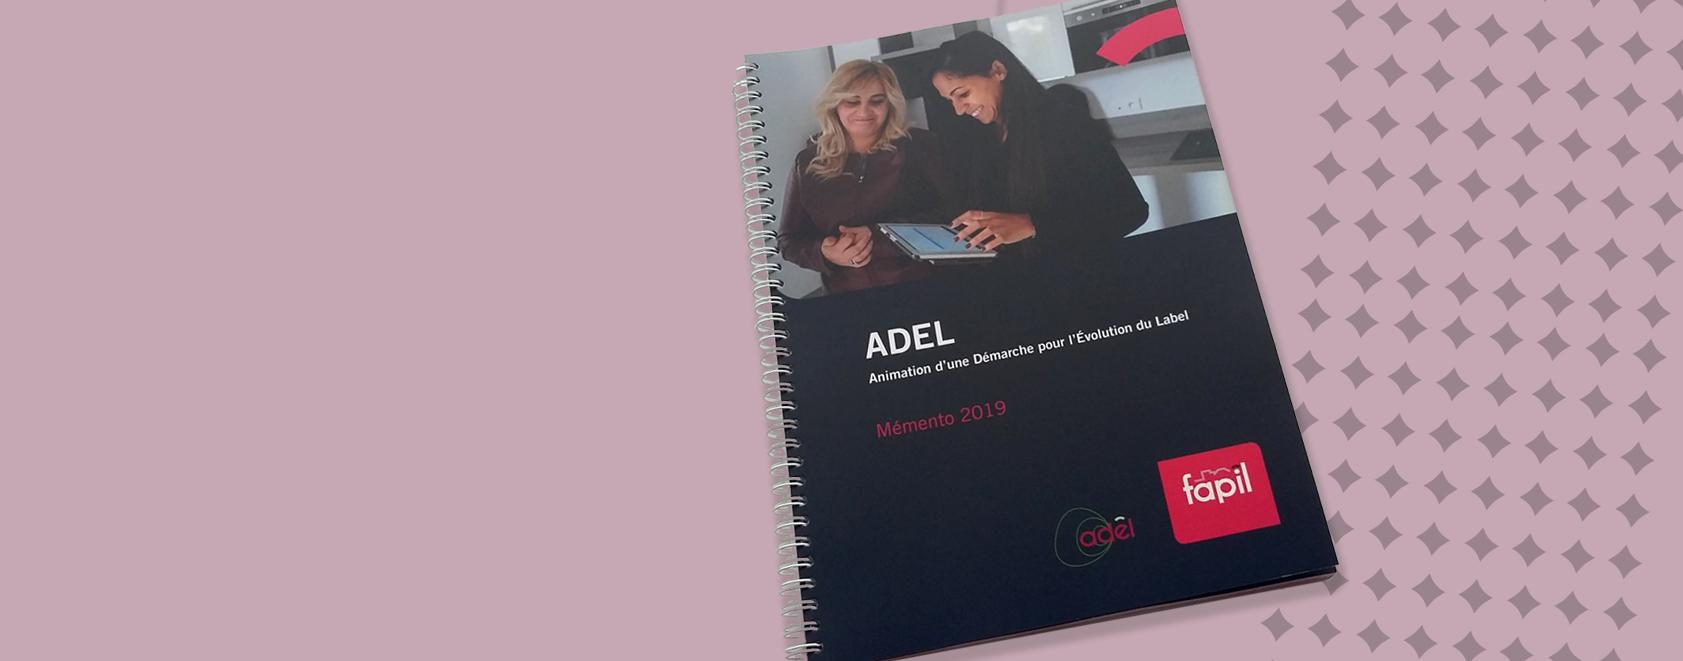 Lancement ADEL 2019